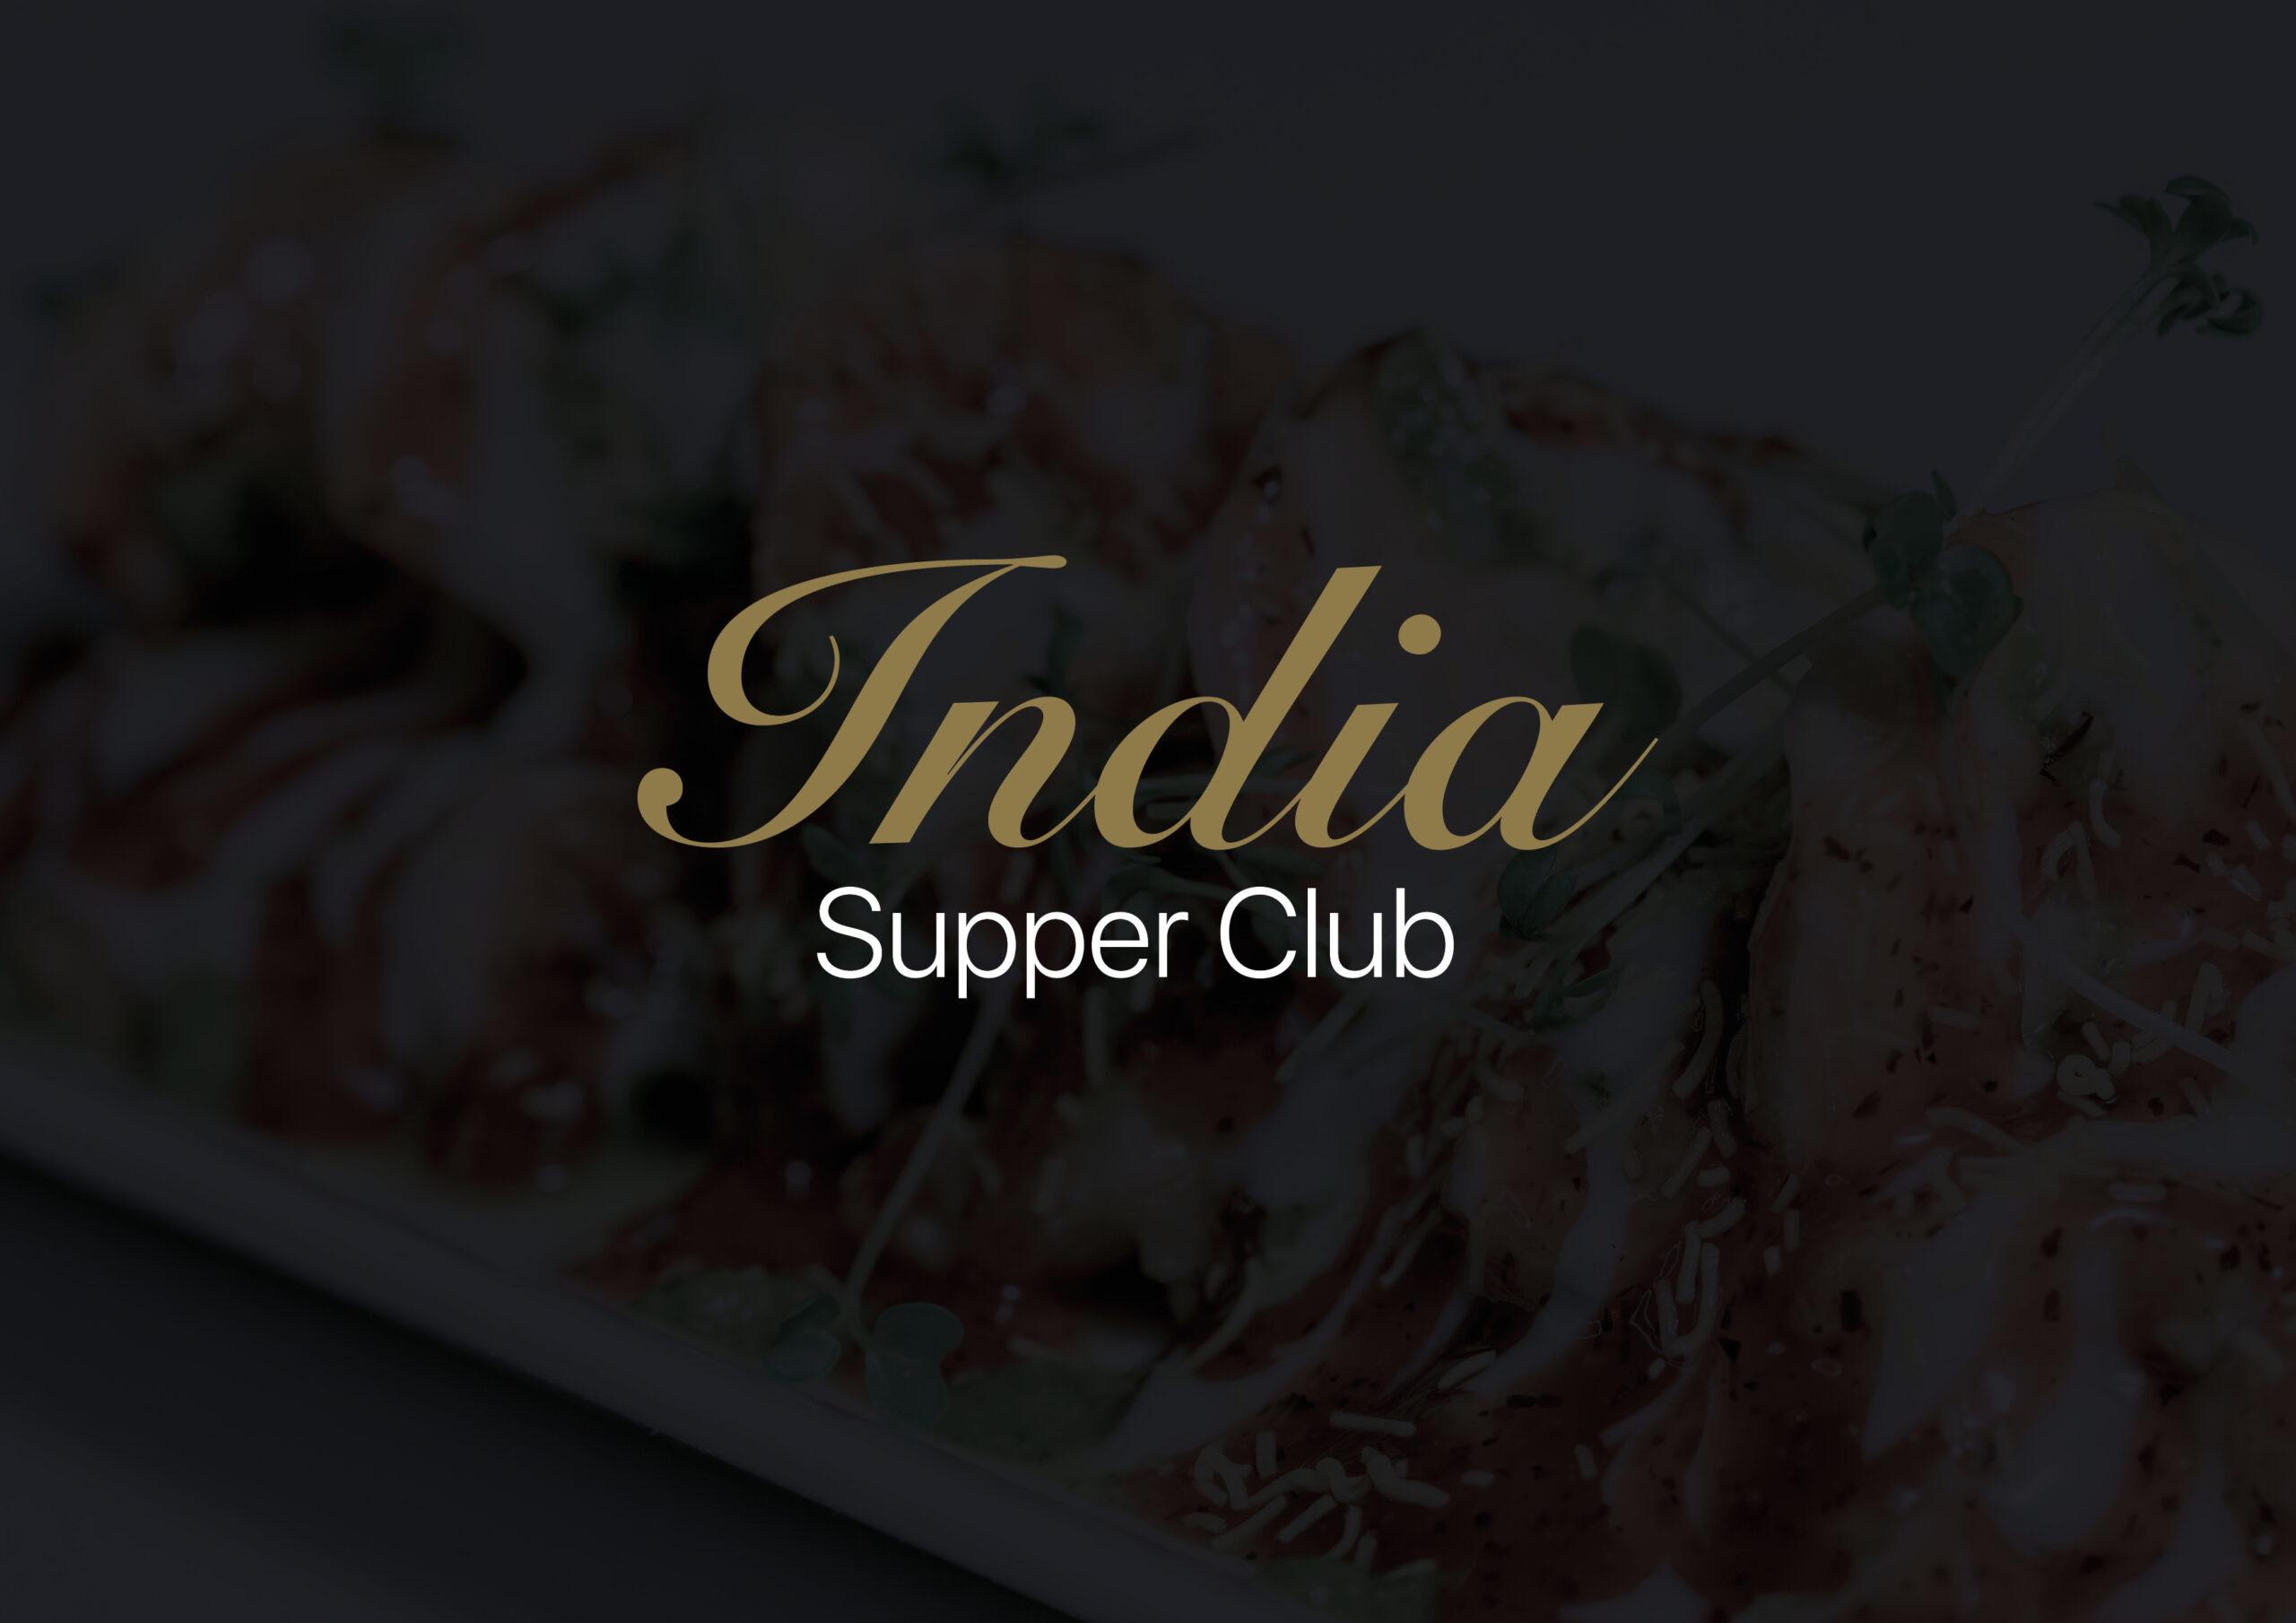 Inda supper club lthumbnail